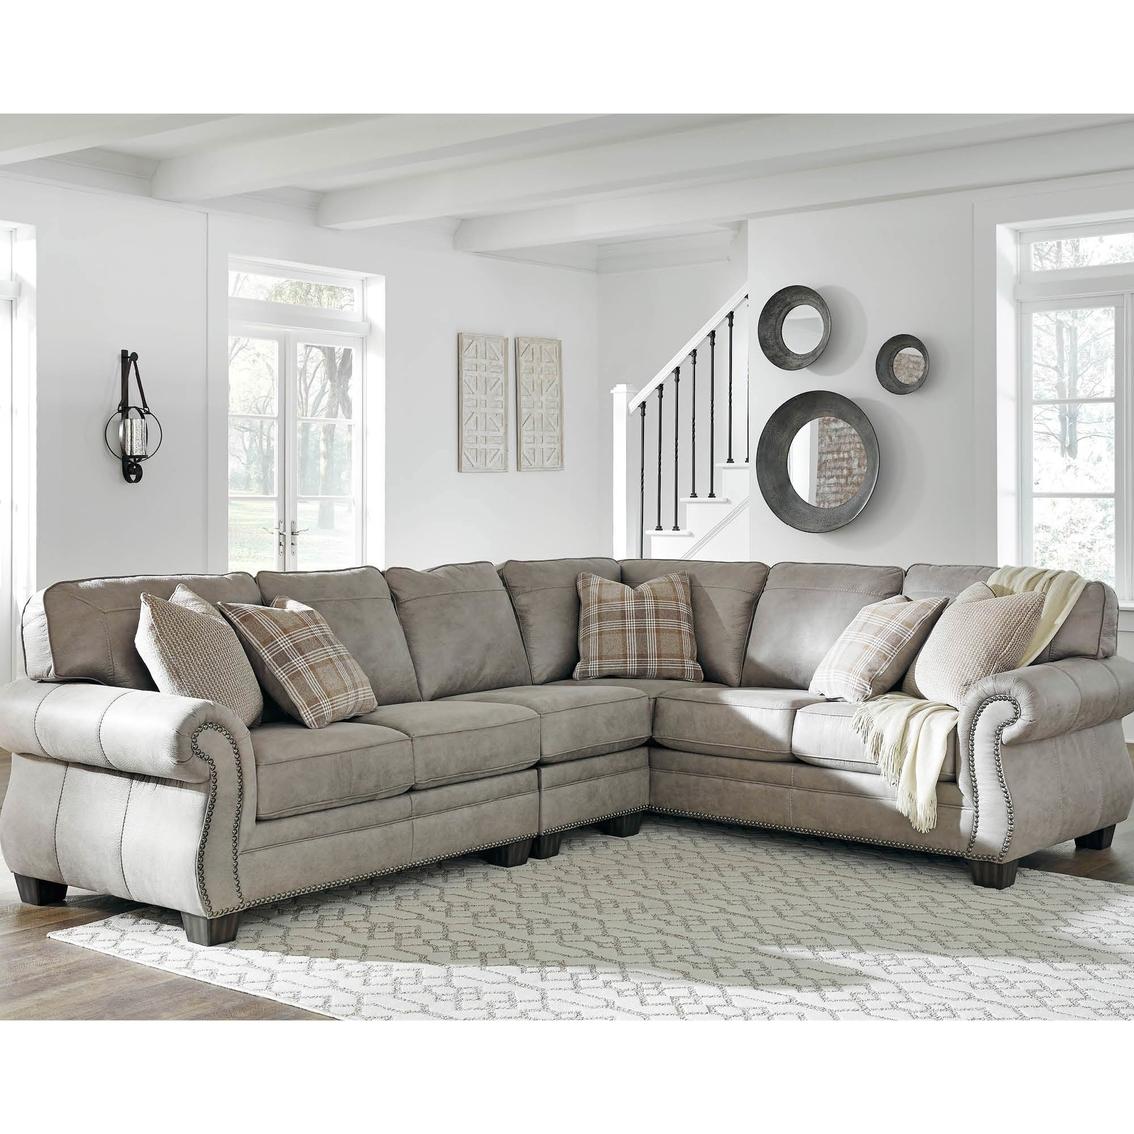 Terrific Signature Design By Ashley Olsberg 3 Pc Sectional Laf Sofa Machost Co Dining Chair Design Ideas Machostcouk